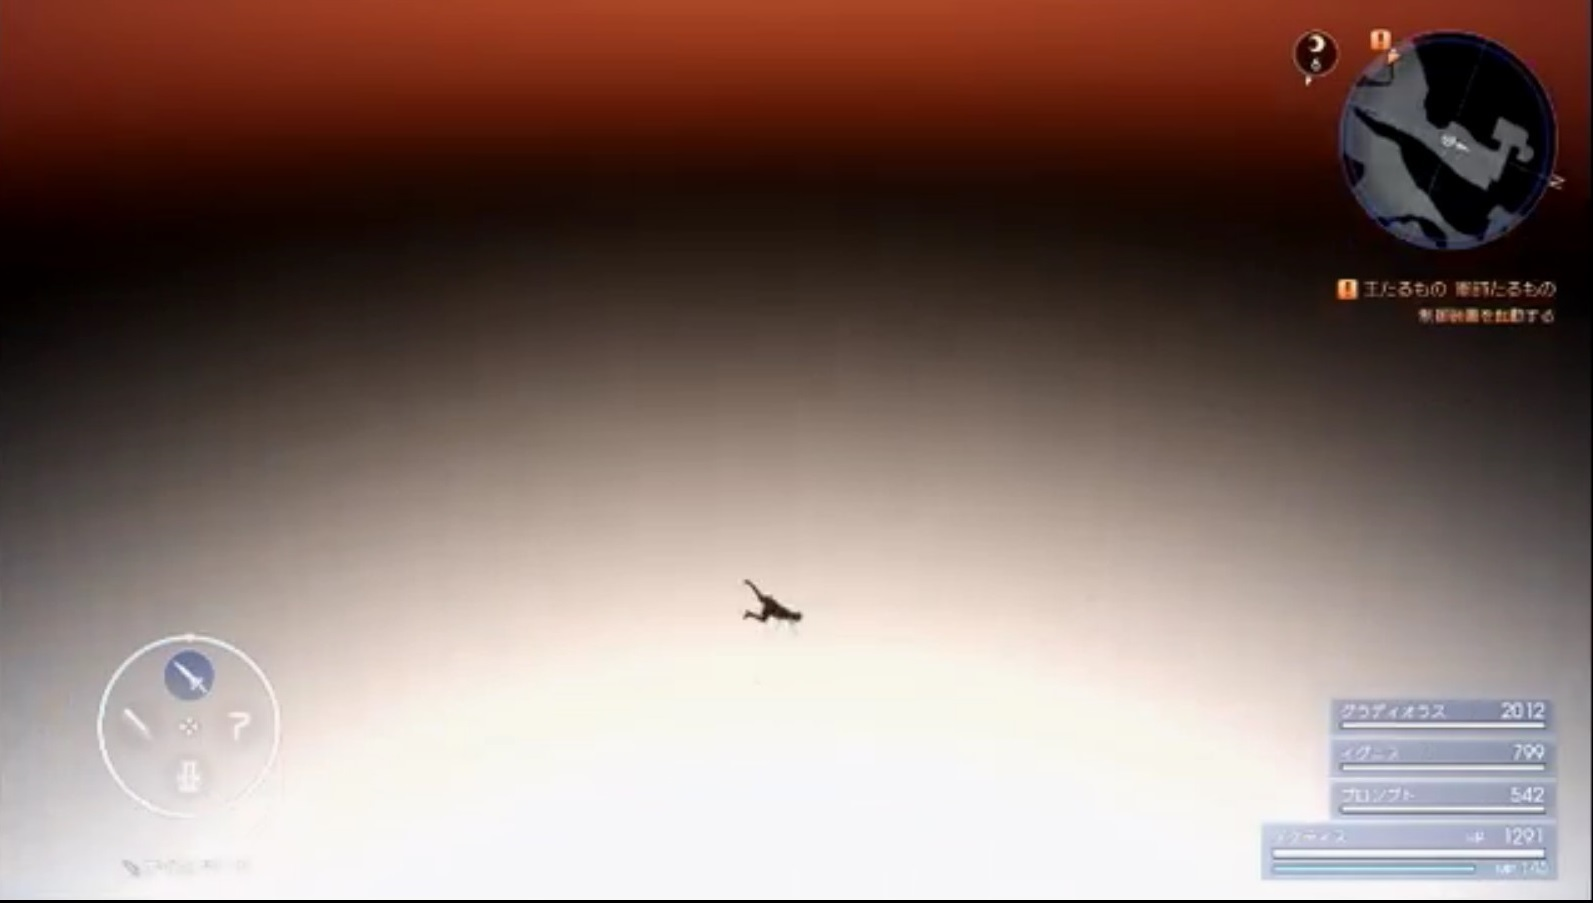 【FF15】体験版を超えるバグが発見されるwwwww